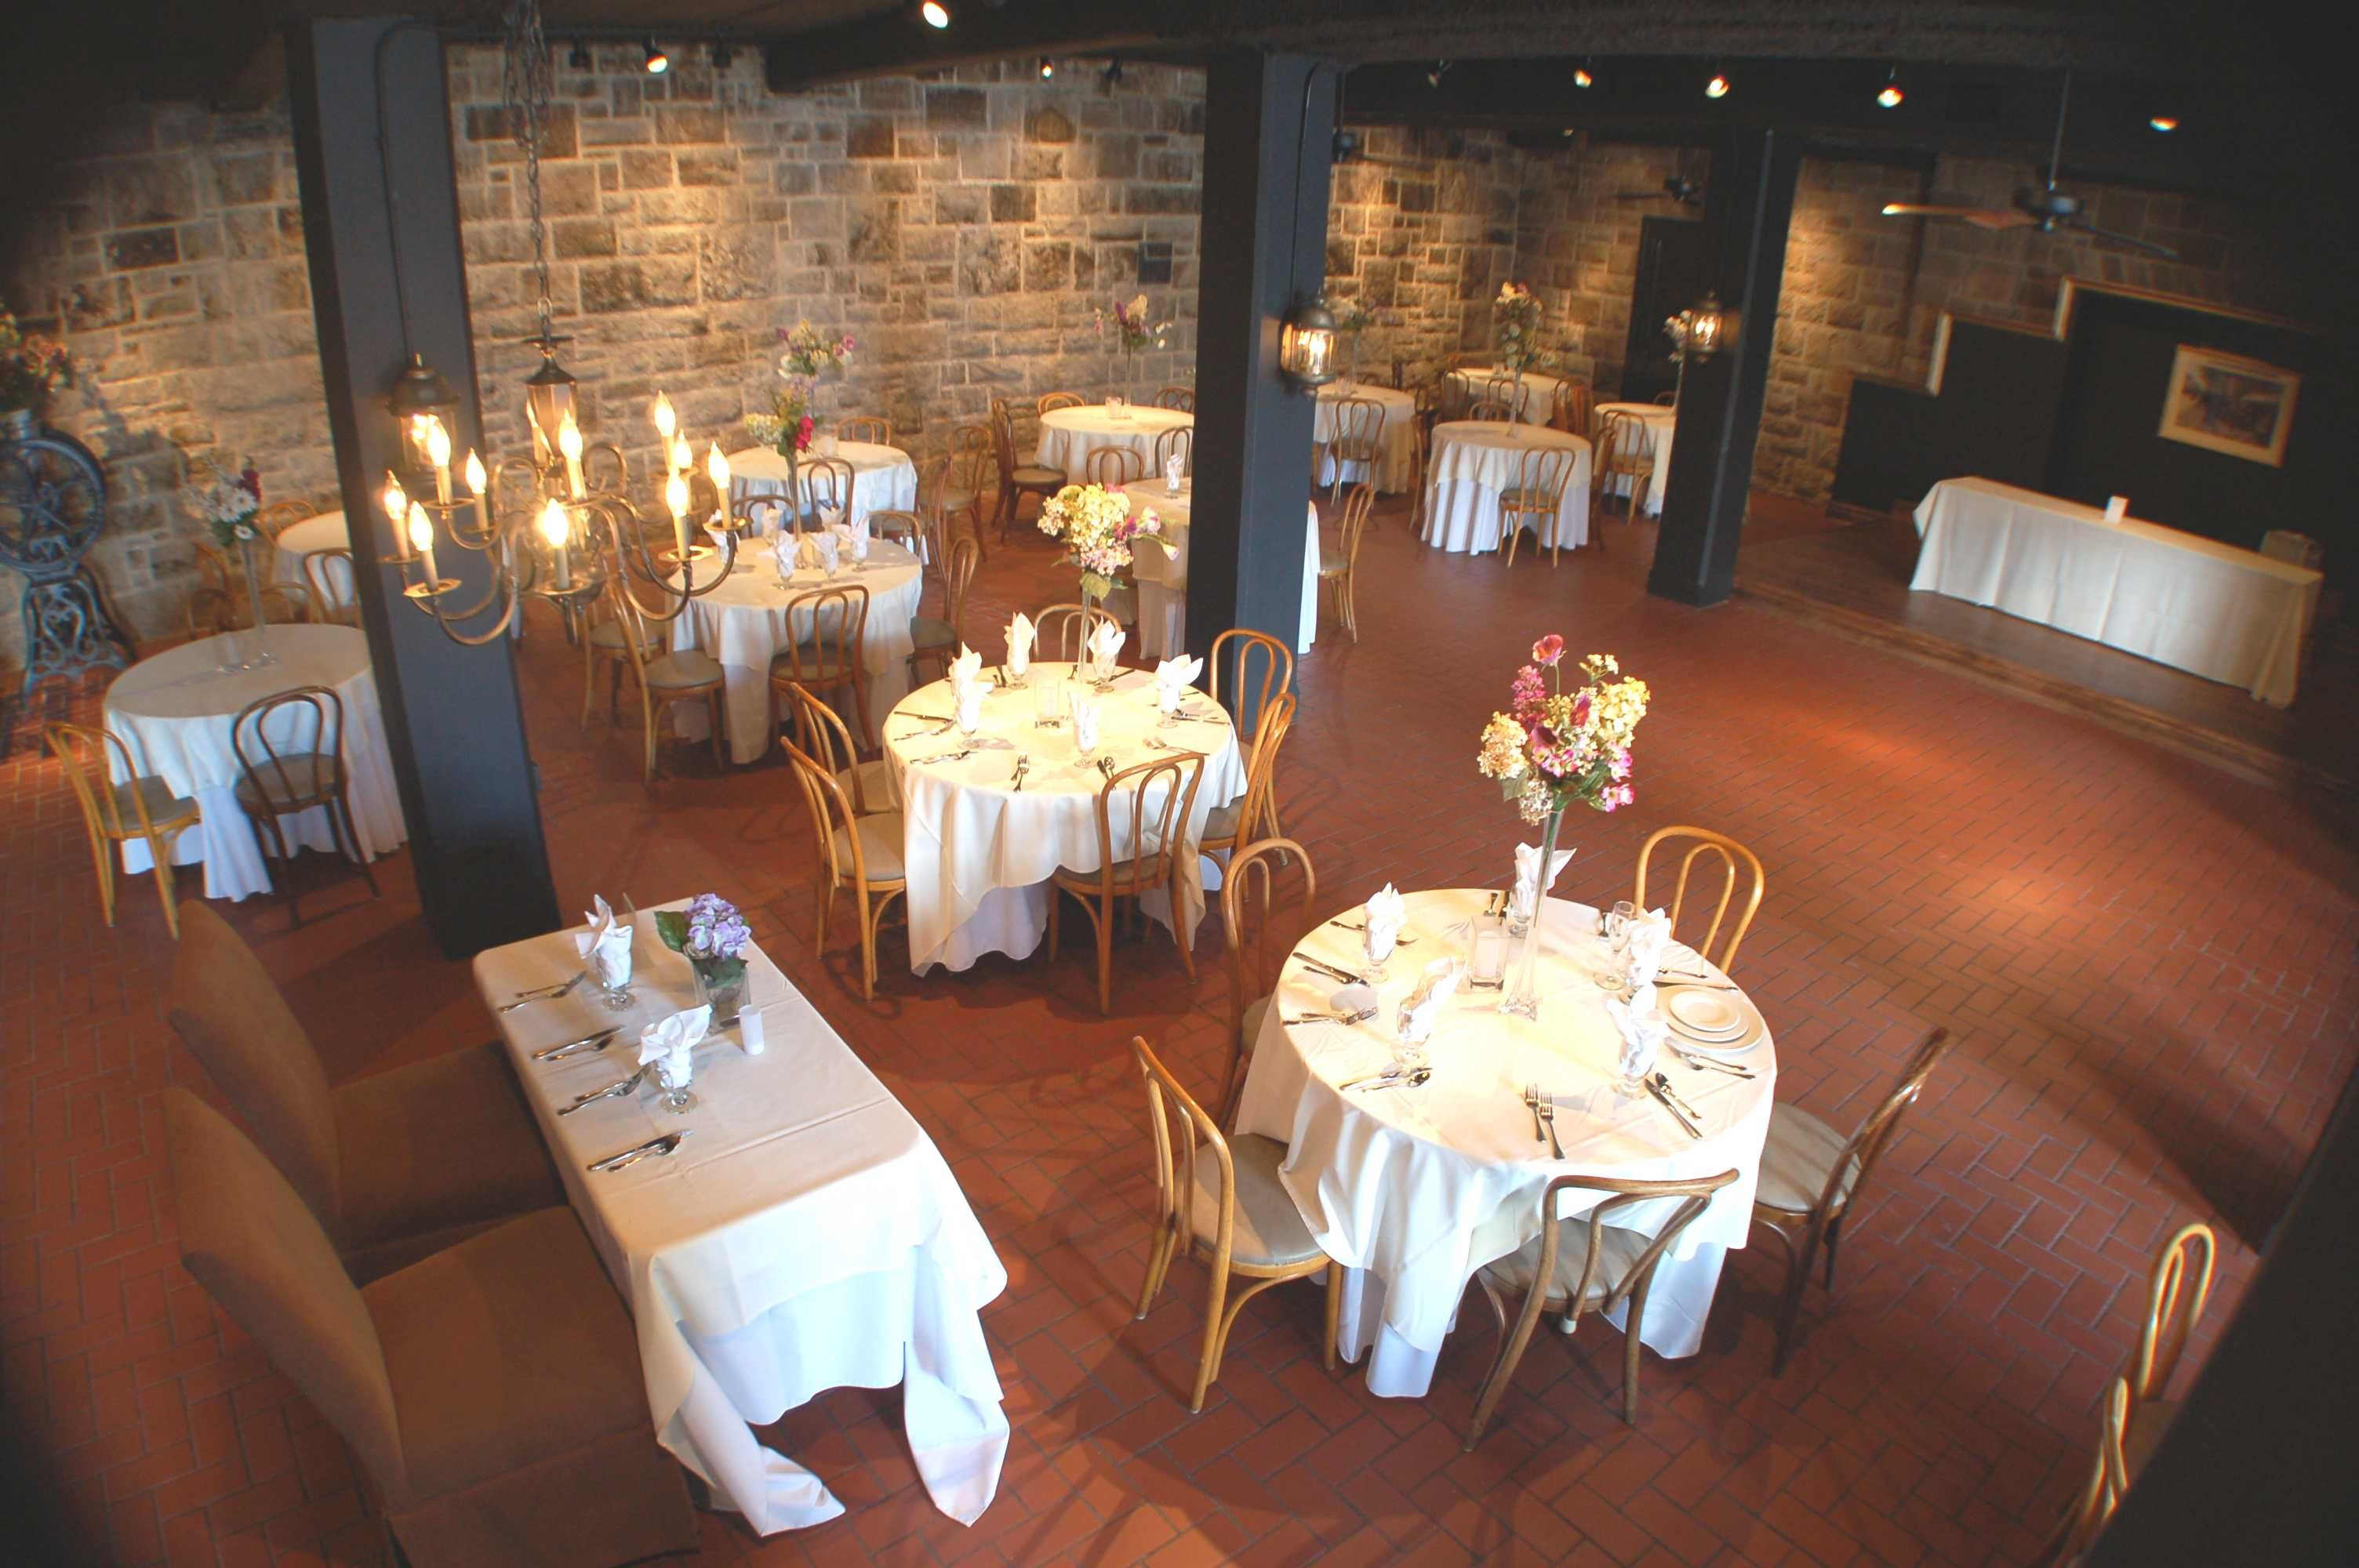 Raisin River Room Wellers In Saline Mi Michigan Wedding Venues Antique Inspired Wedding Chic Wedding